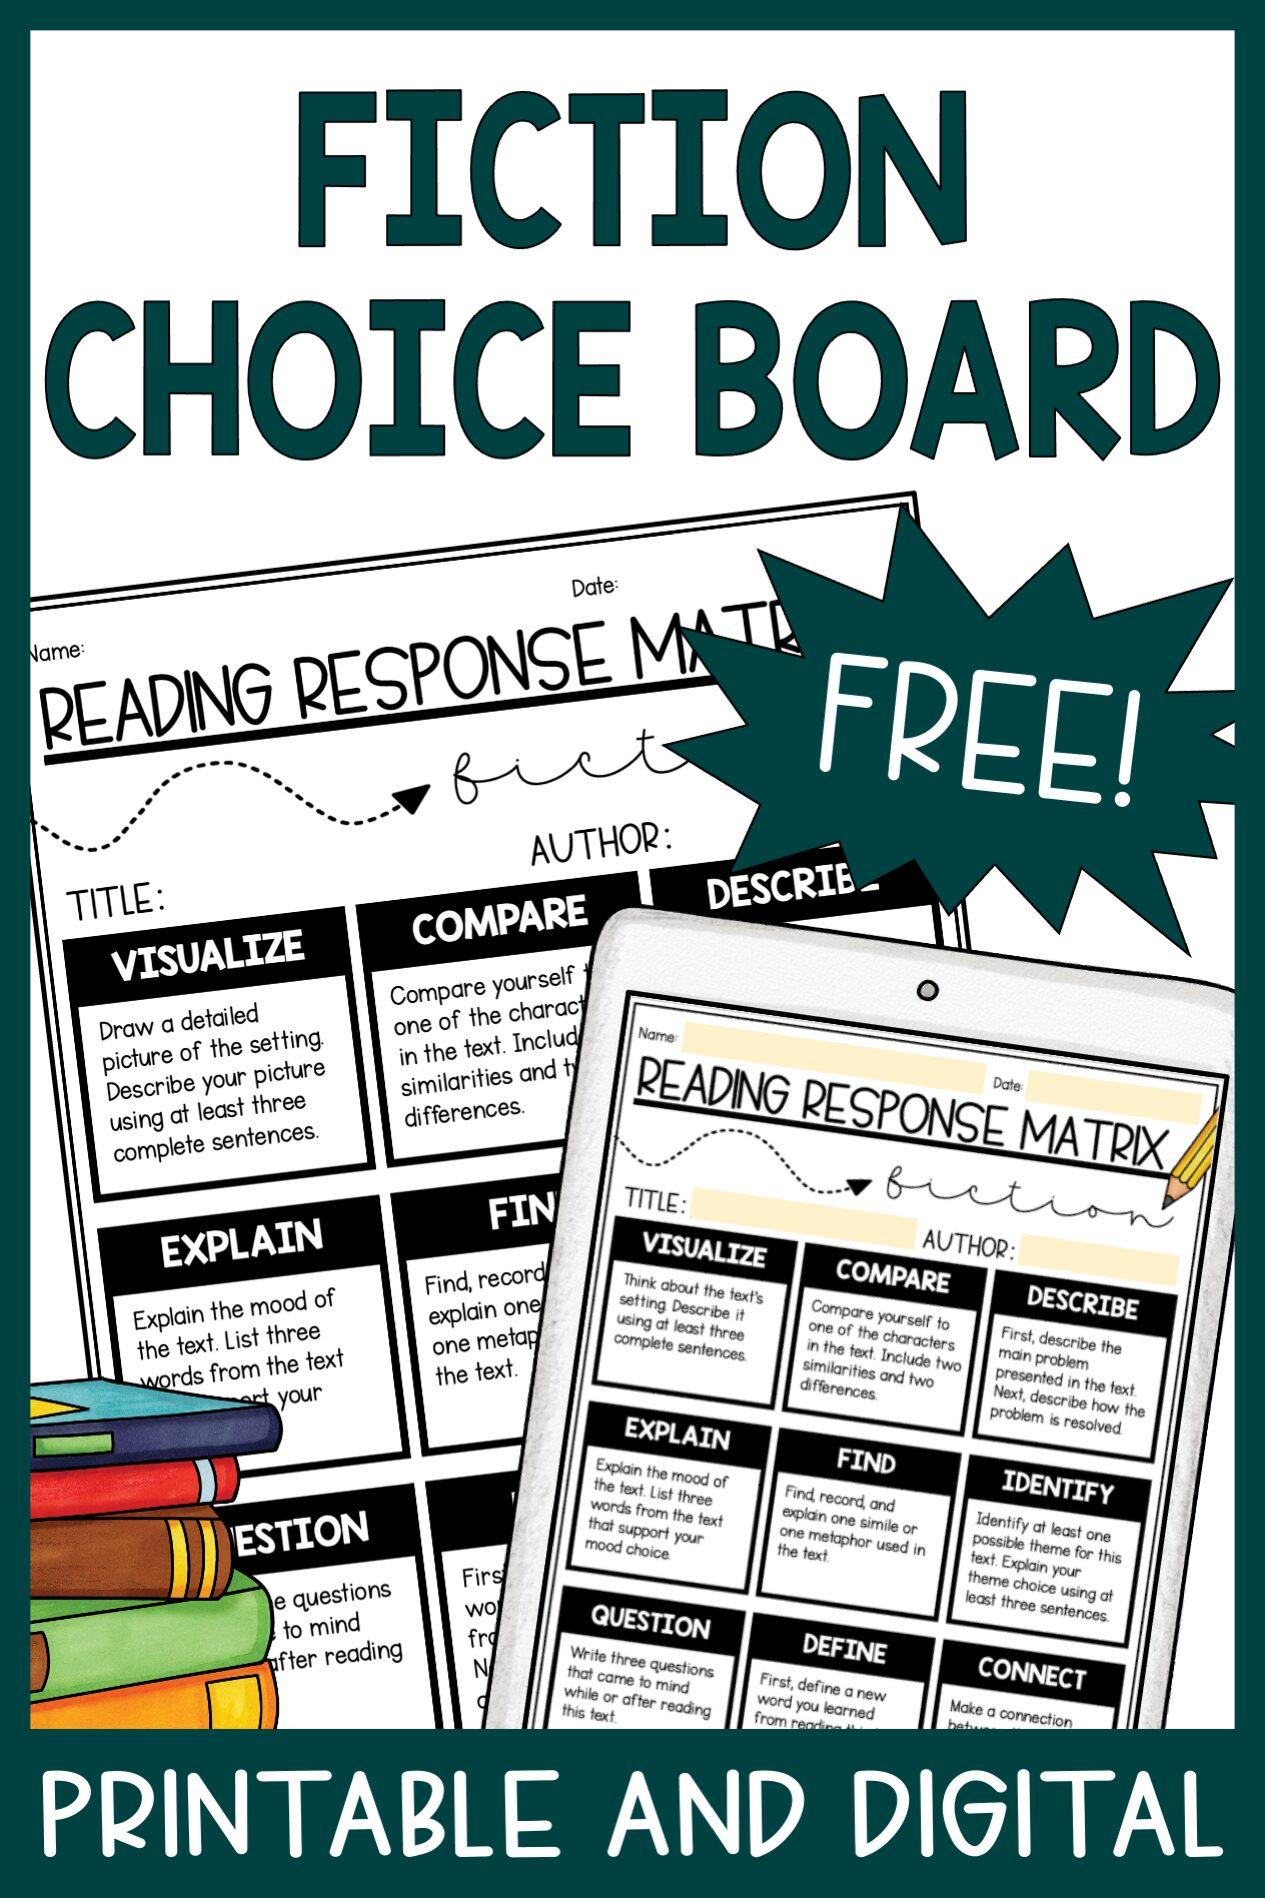 Free Fiction Choice Board for Teachers